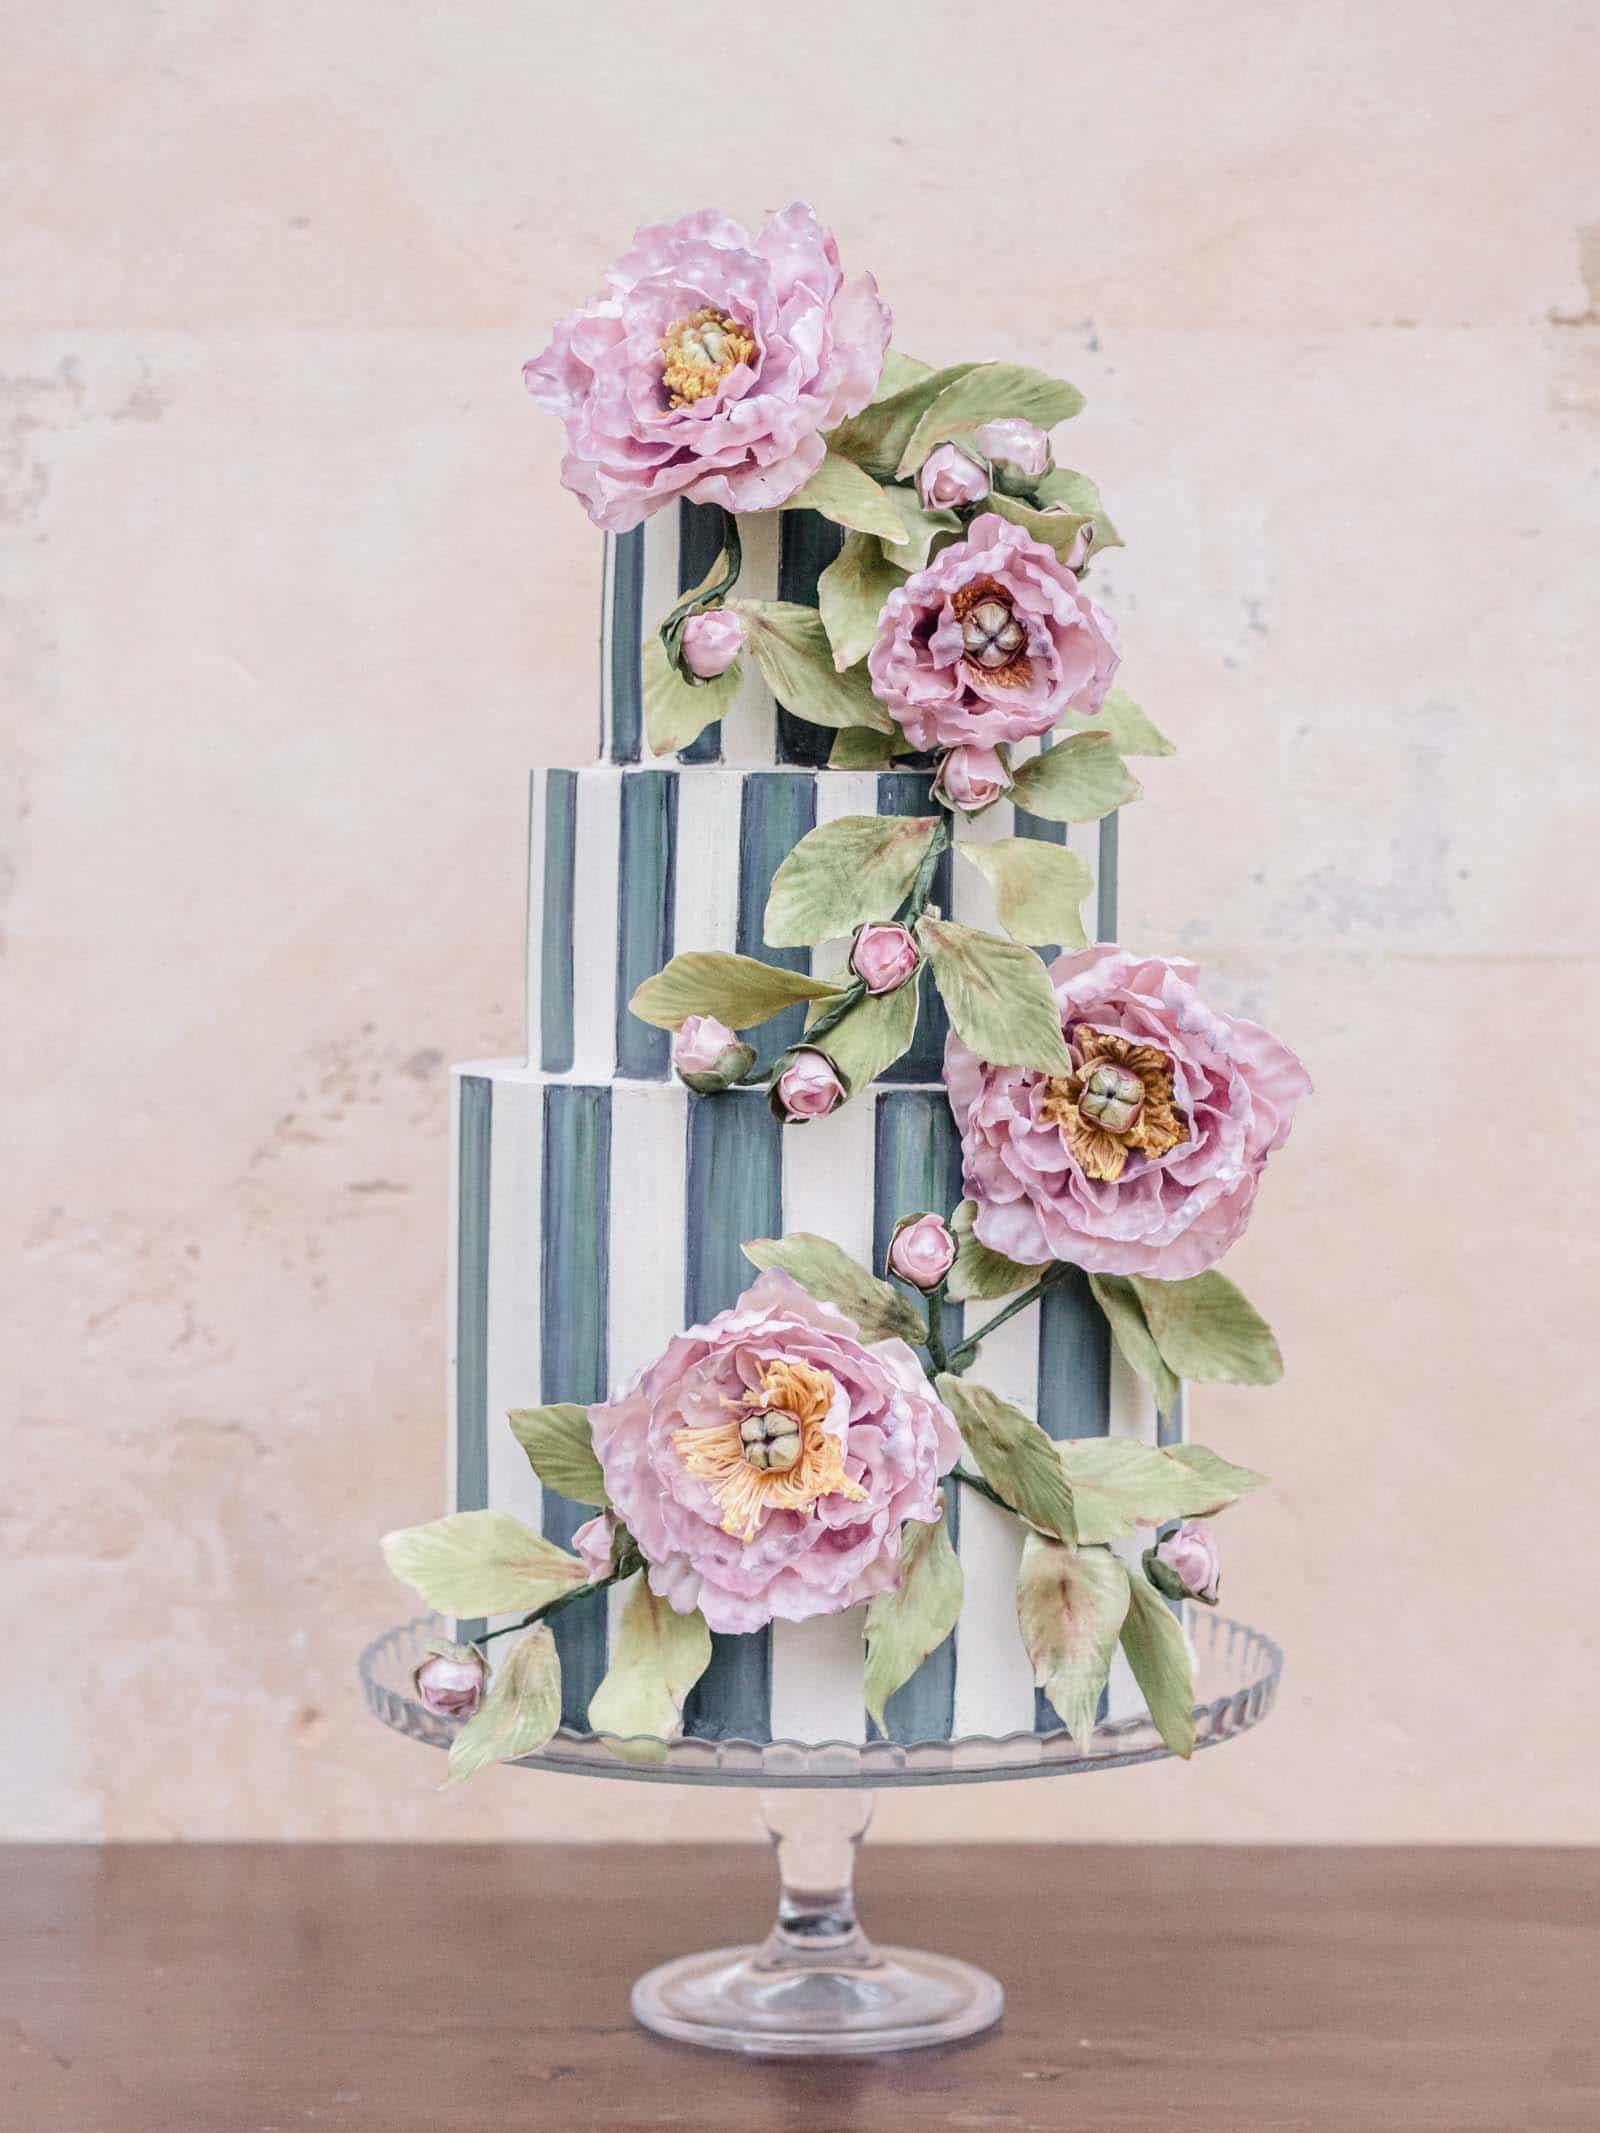 Wedding Cake Siena Italy at Castello di Celsa by Tuscan Wedding Cakes.